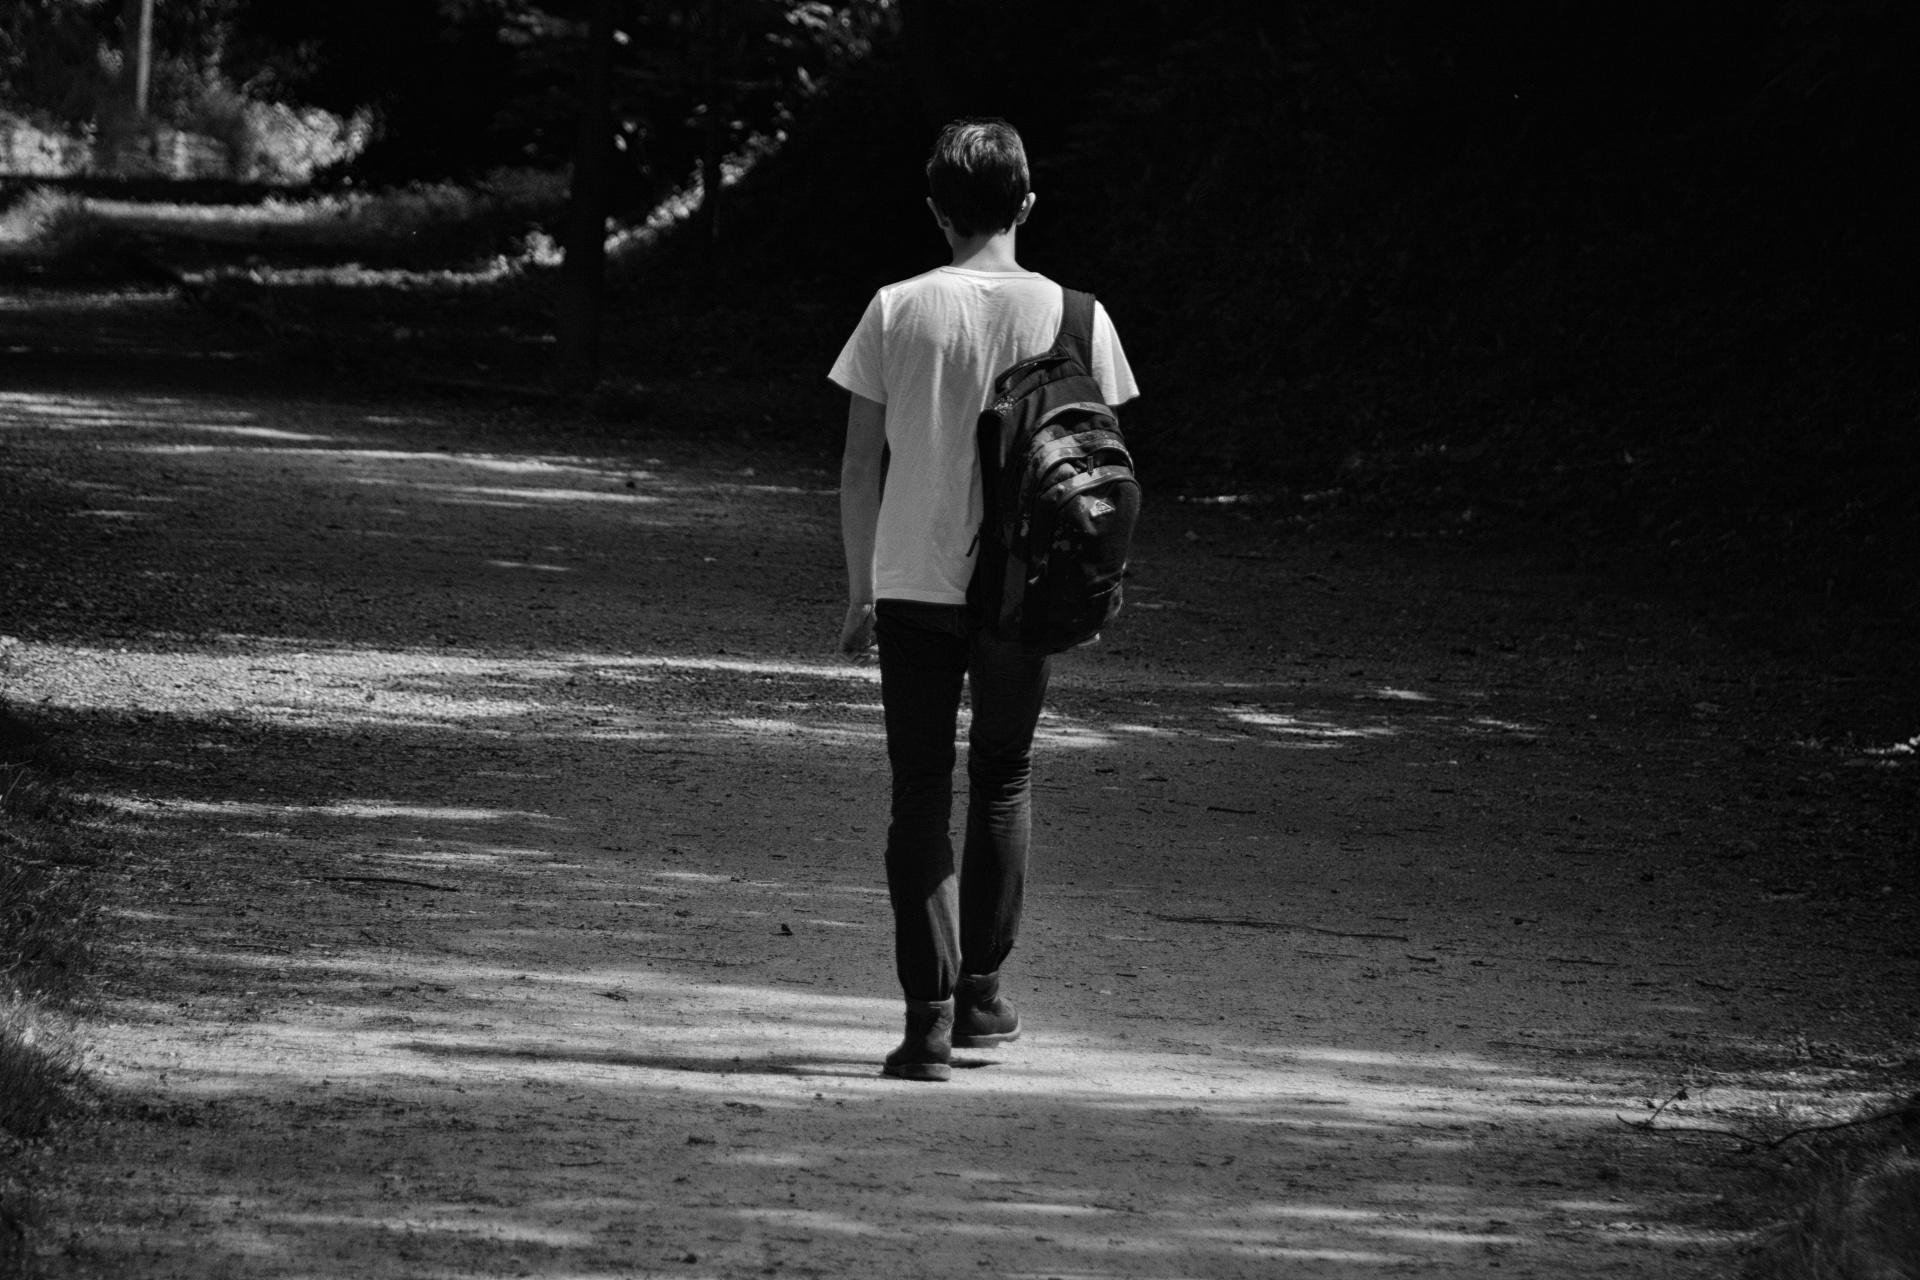 Lonely walk photo